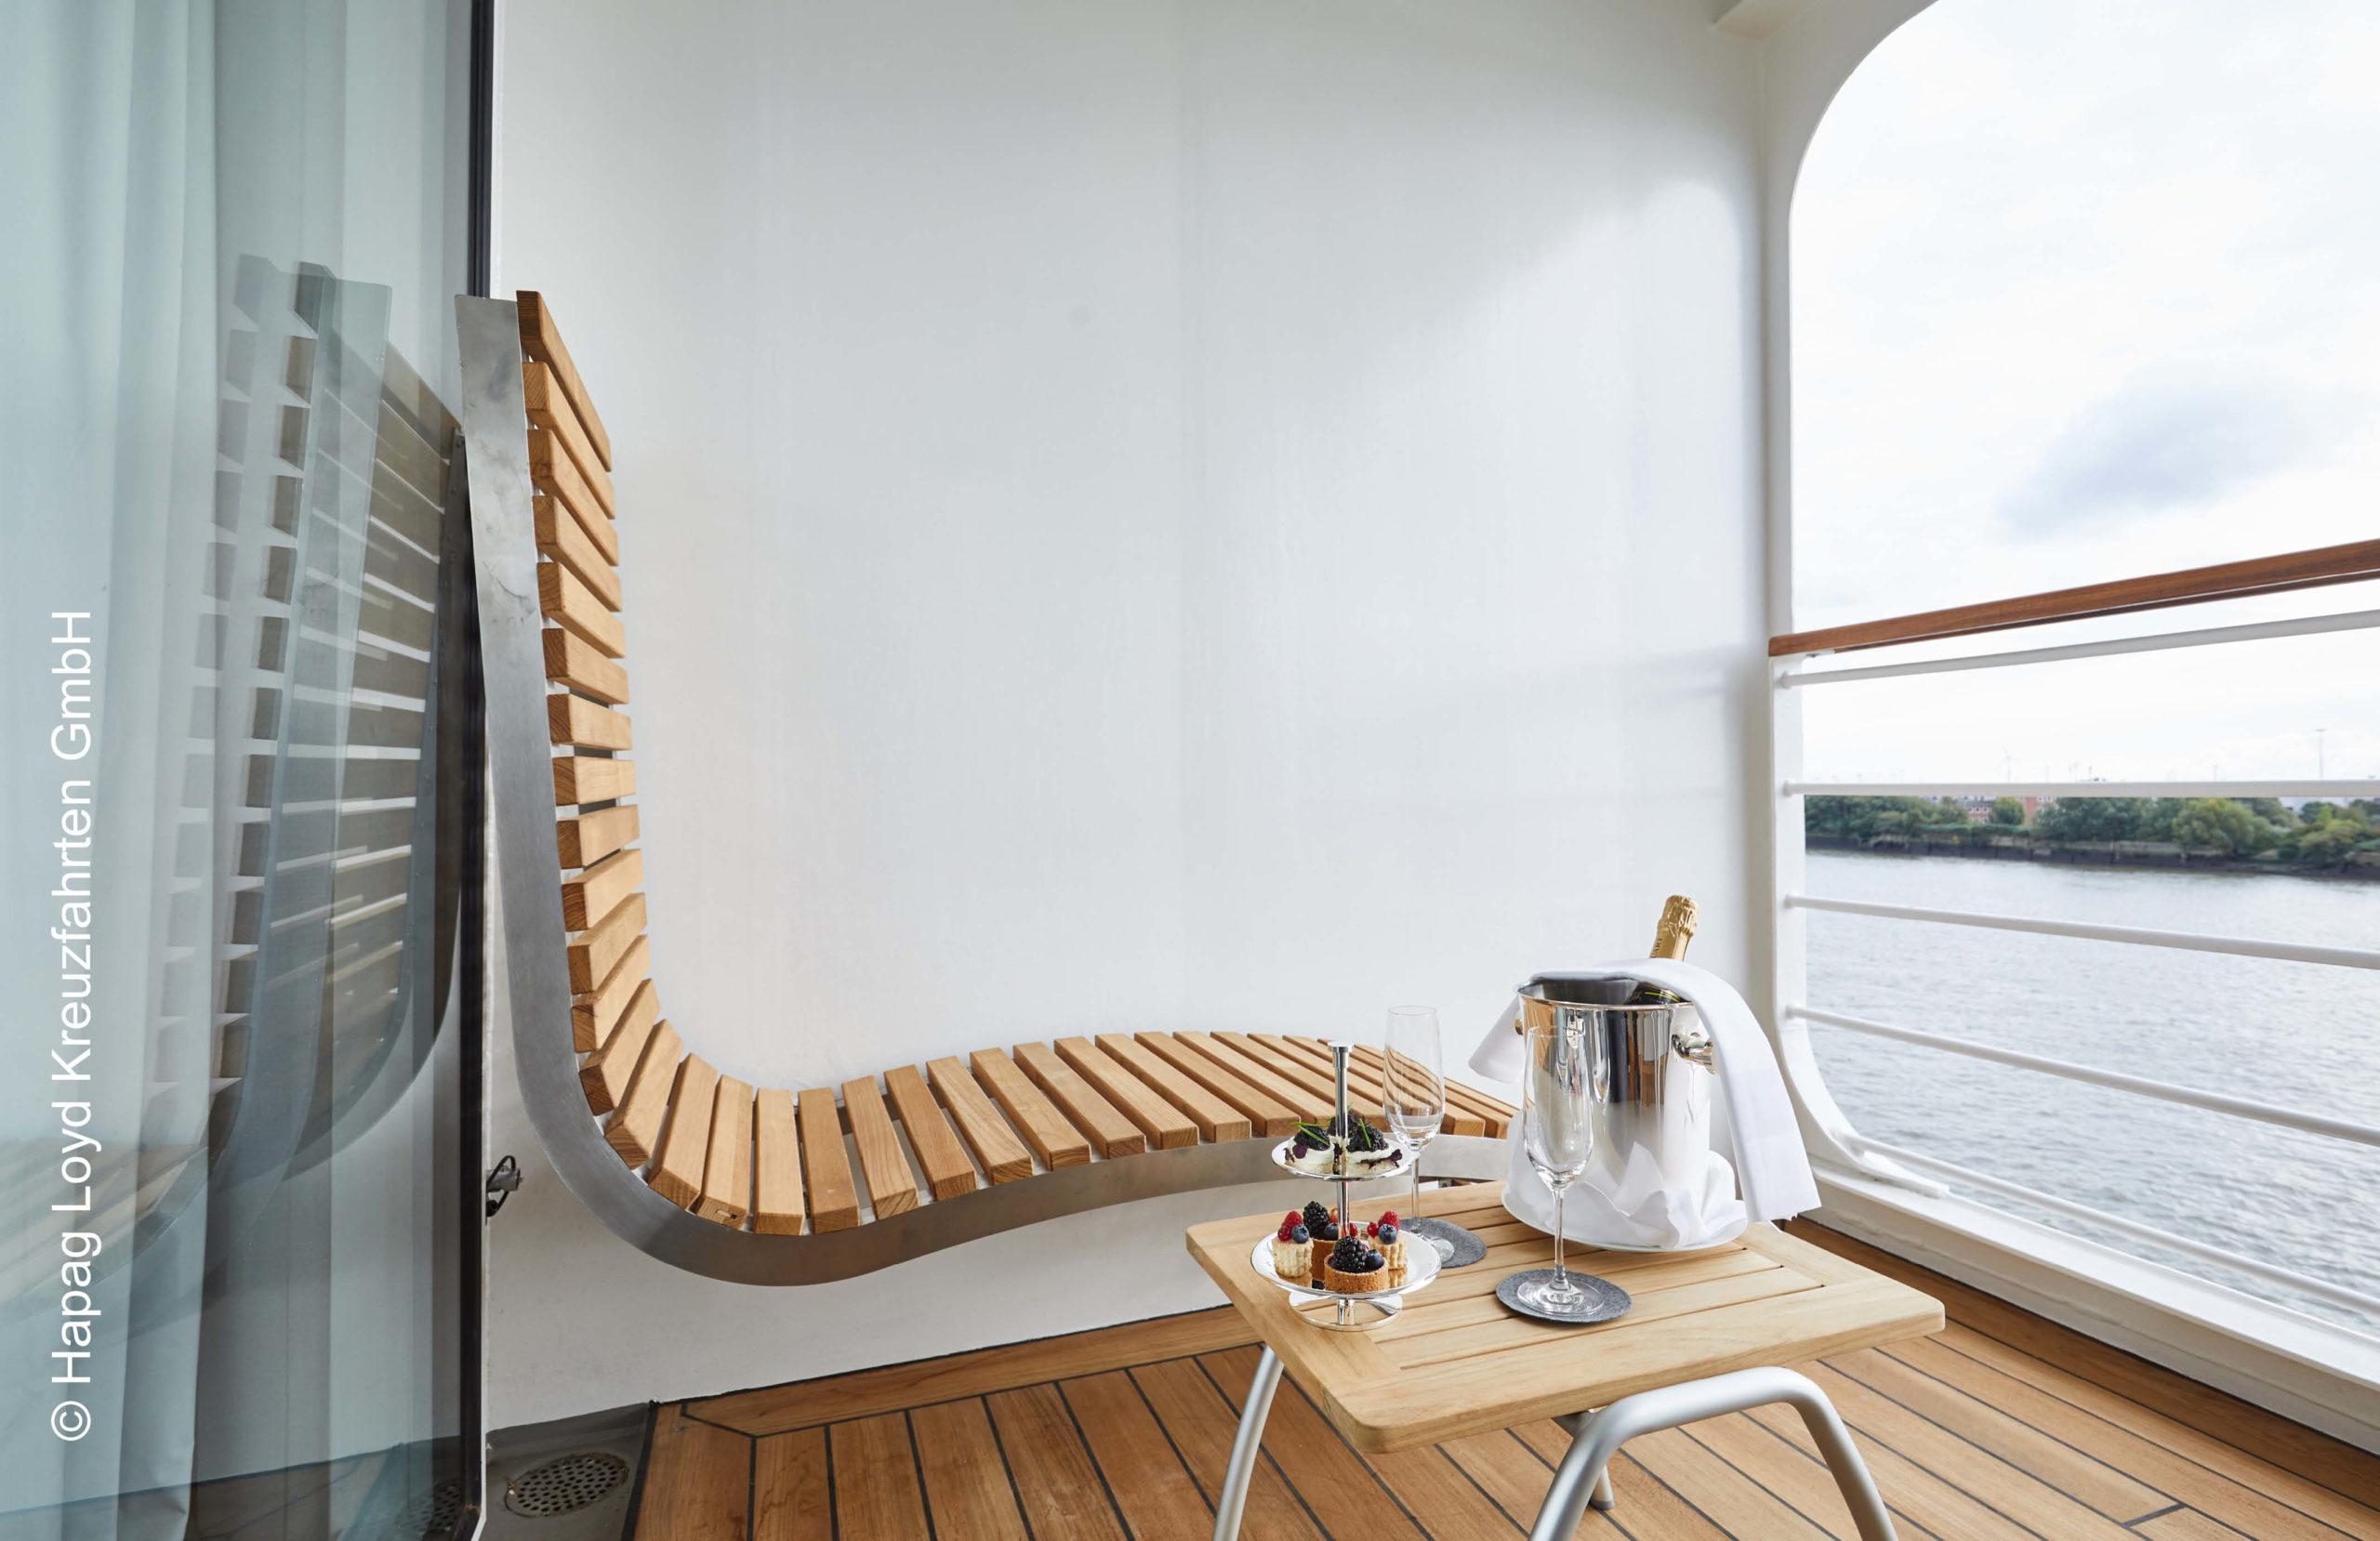 Hapag Lloys Hanseatic inspiration Junior Suite Balkon